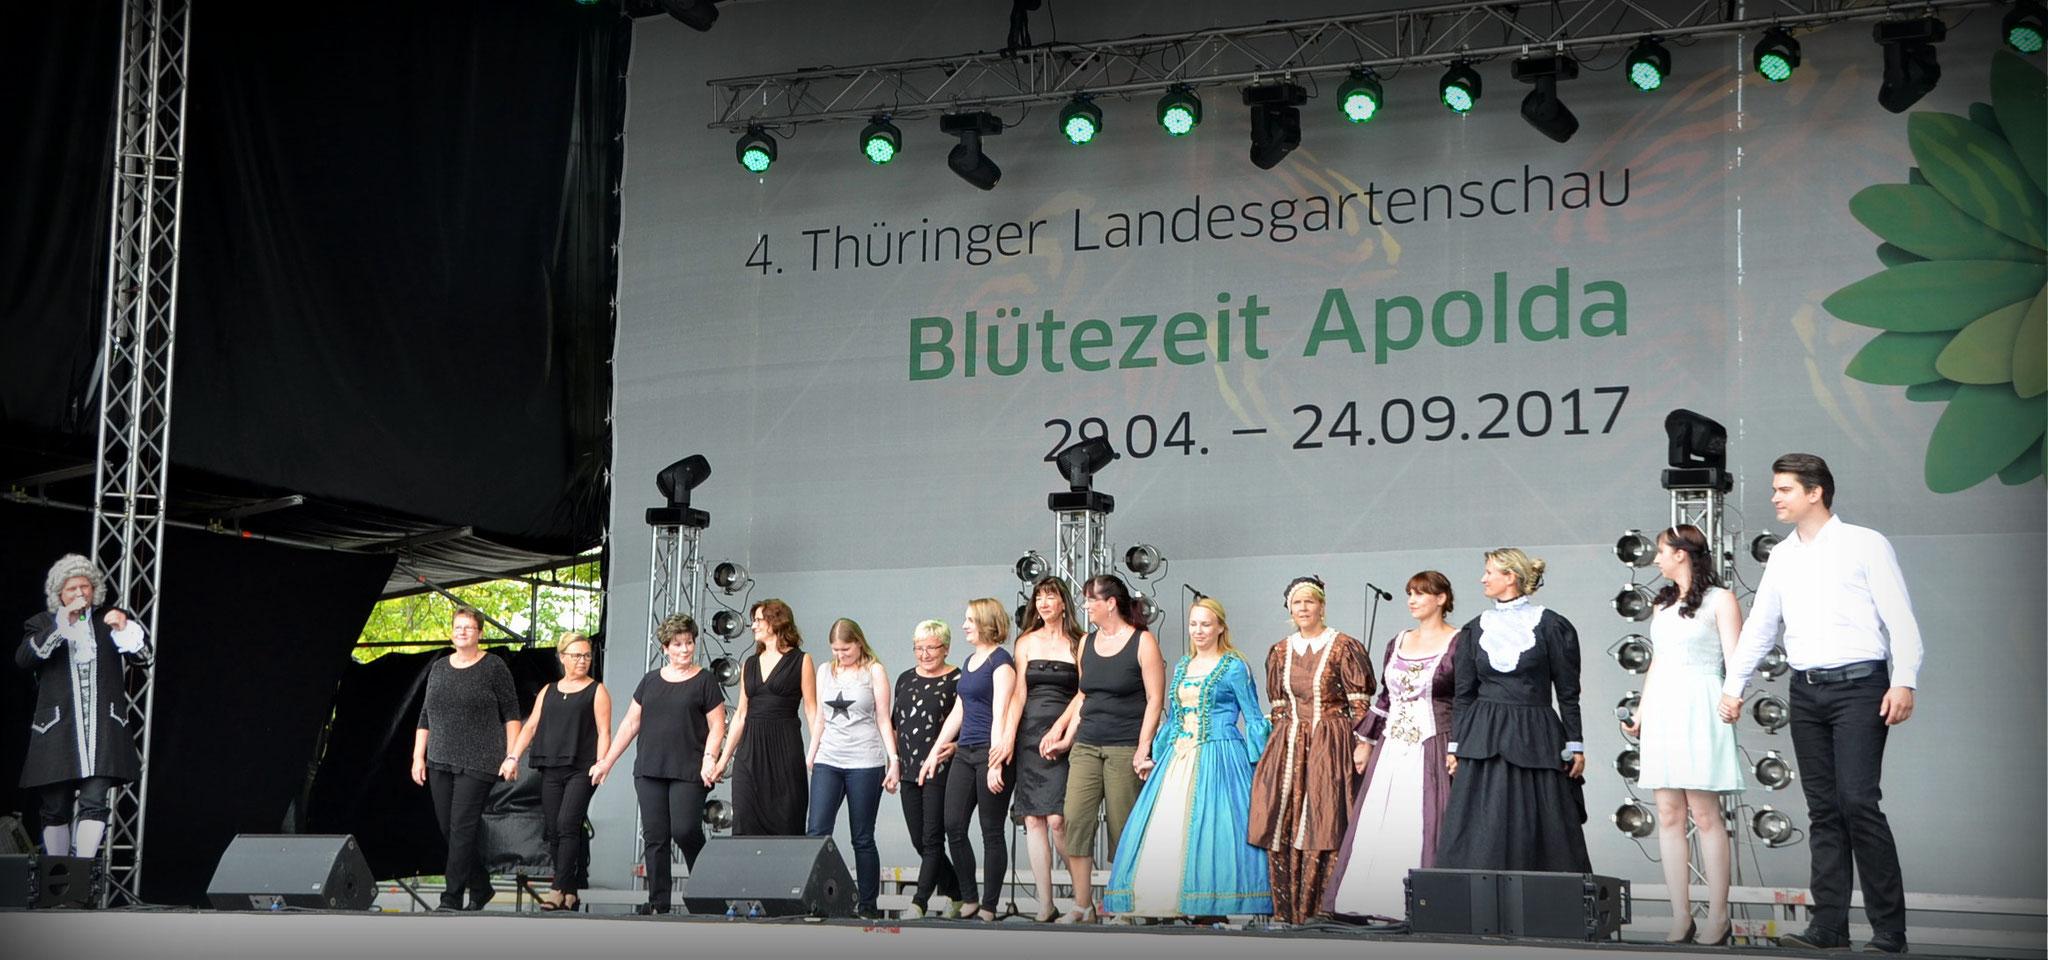 25.06.2017 Landesgartenschau in Apolda (Foto: Johannes Kunze)